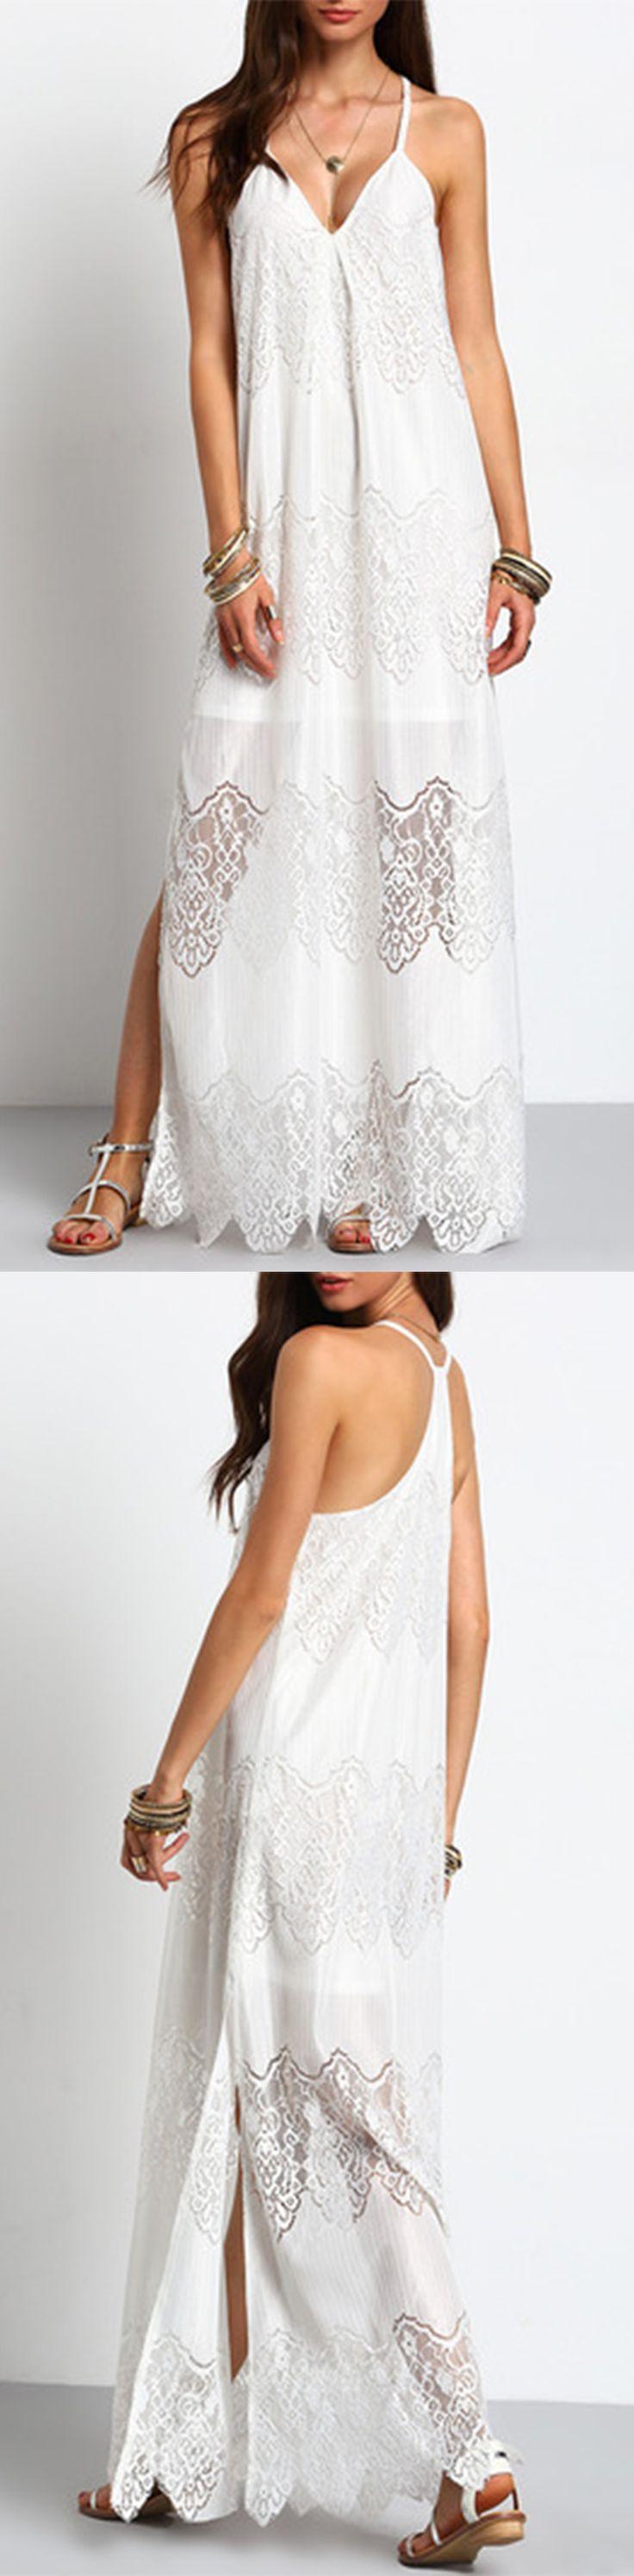 Summer beach weeding dress. Pretty maxi beach dress. Gorgeous white crochet lace dress fromshein.com. Cream Deep V Neck Split Slip Maxi Dress.